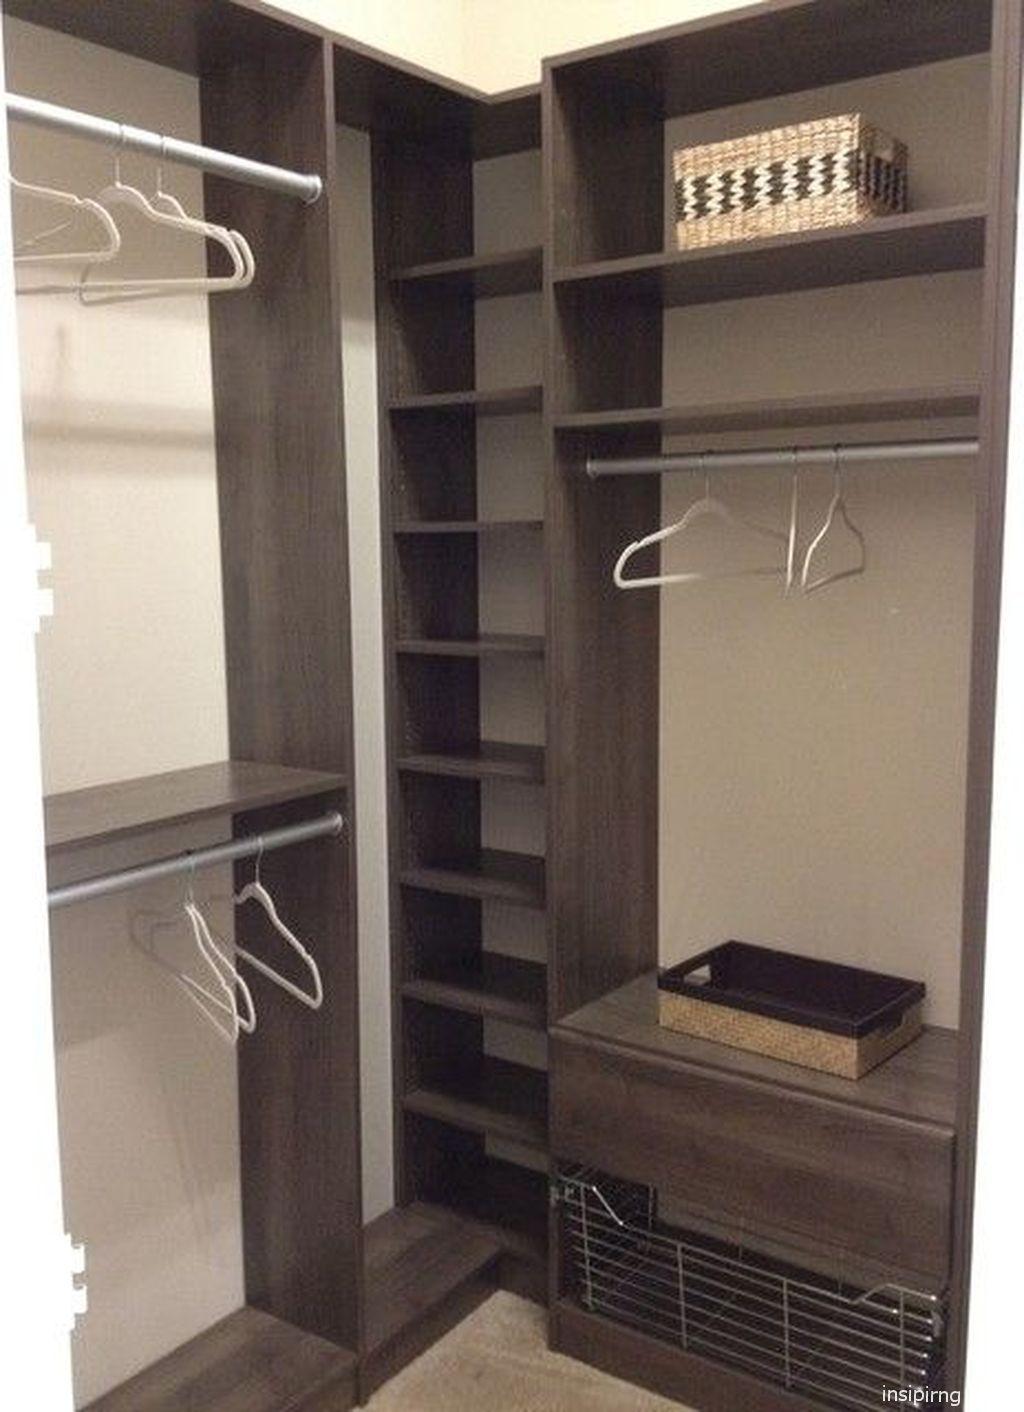 109 Genius Small Closet Ideas Corner Wardrobe Closet Corner Closet No Closet Solutions